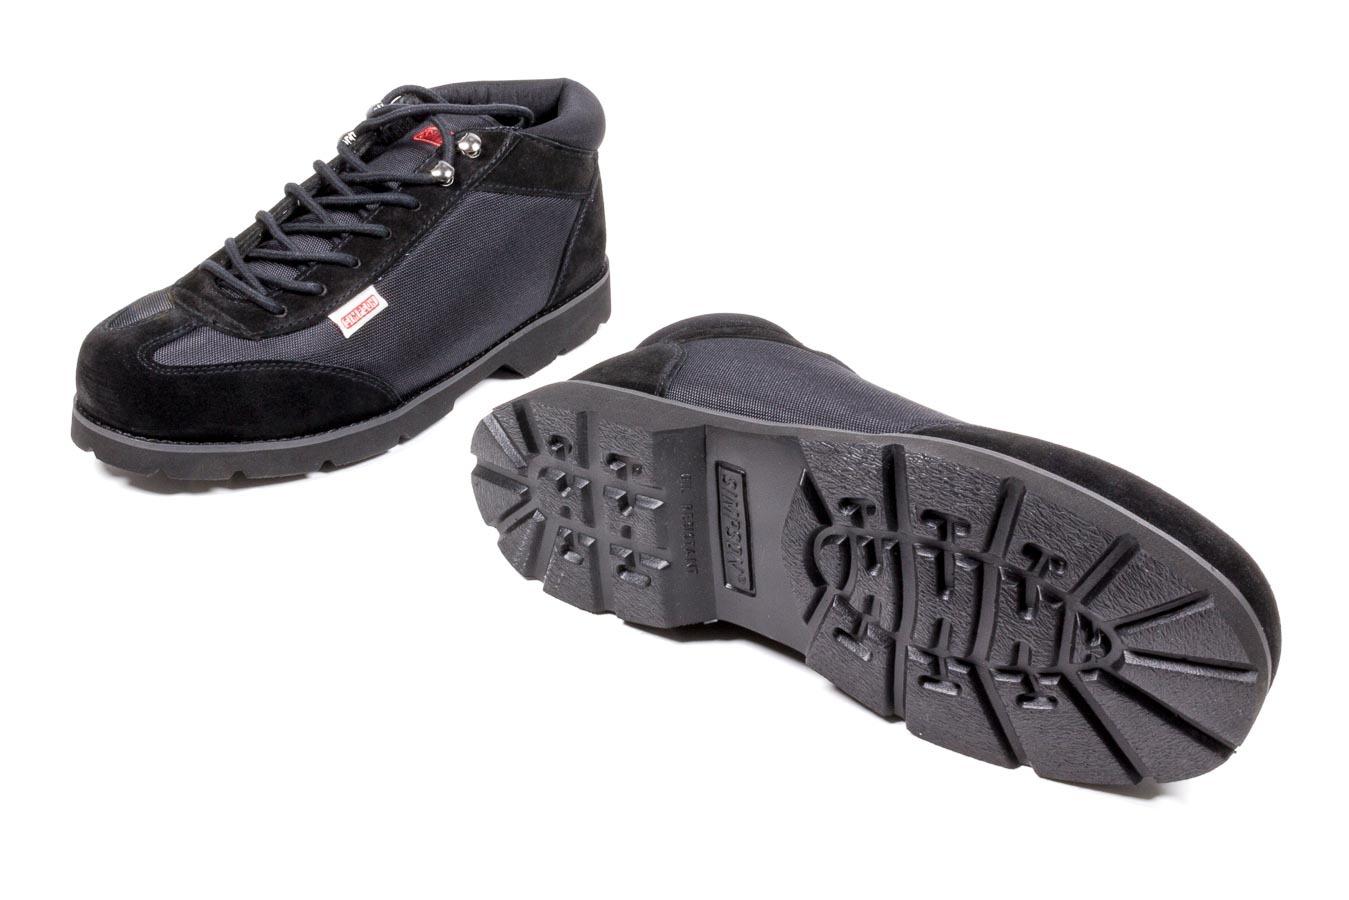 Simpson Safety Crew Shoe Size 13 Black